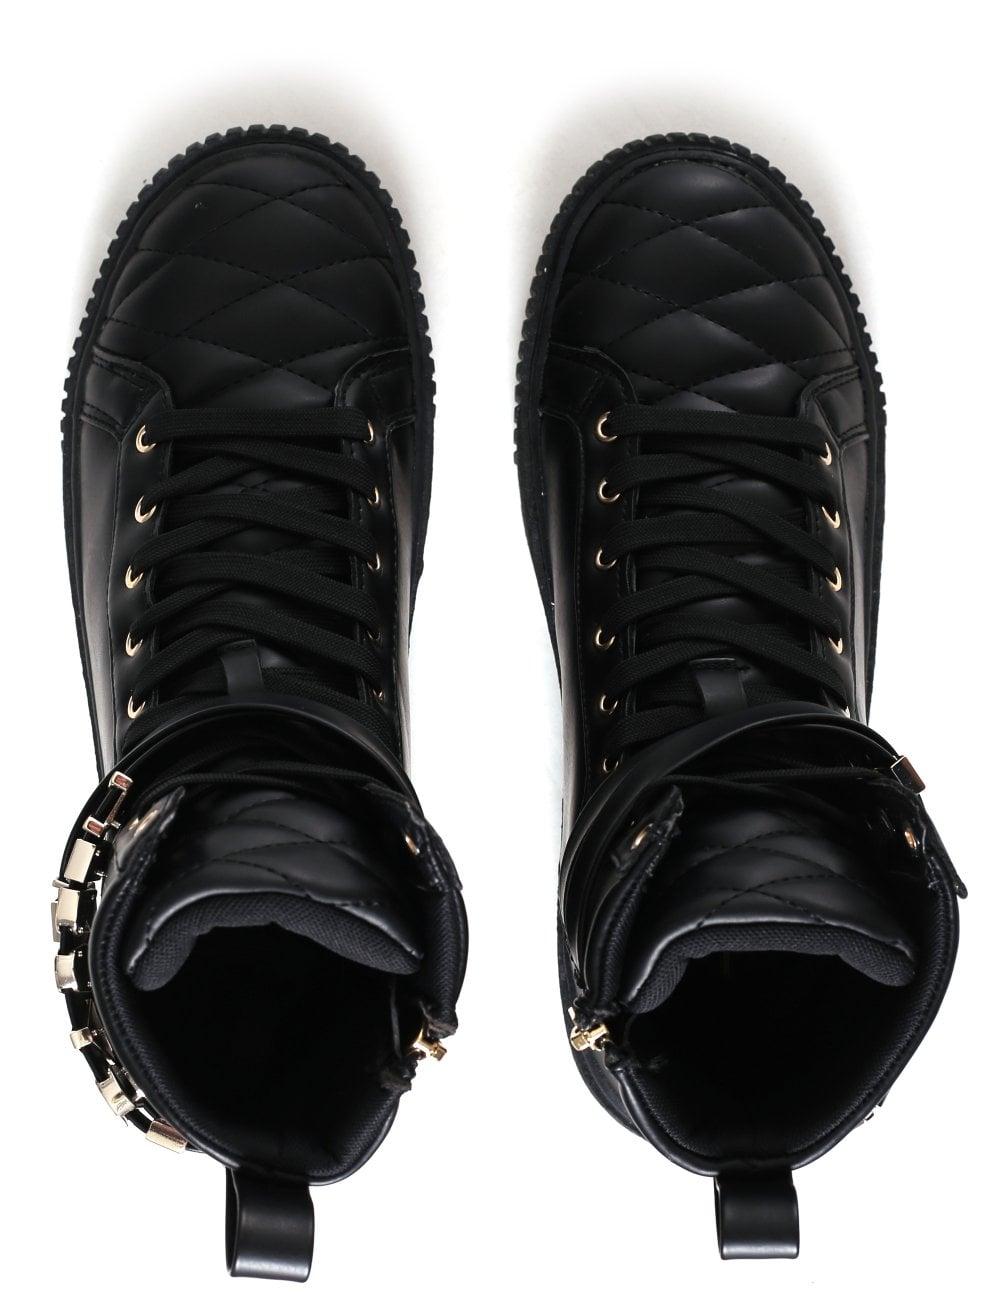 110ce077 Versace Jeans Women's HI Top Letter Sneaker